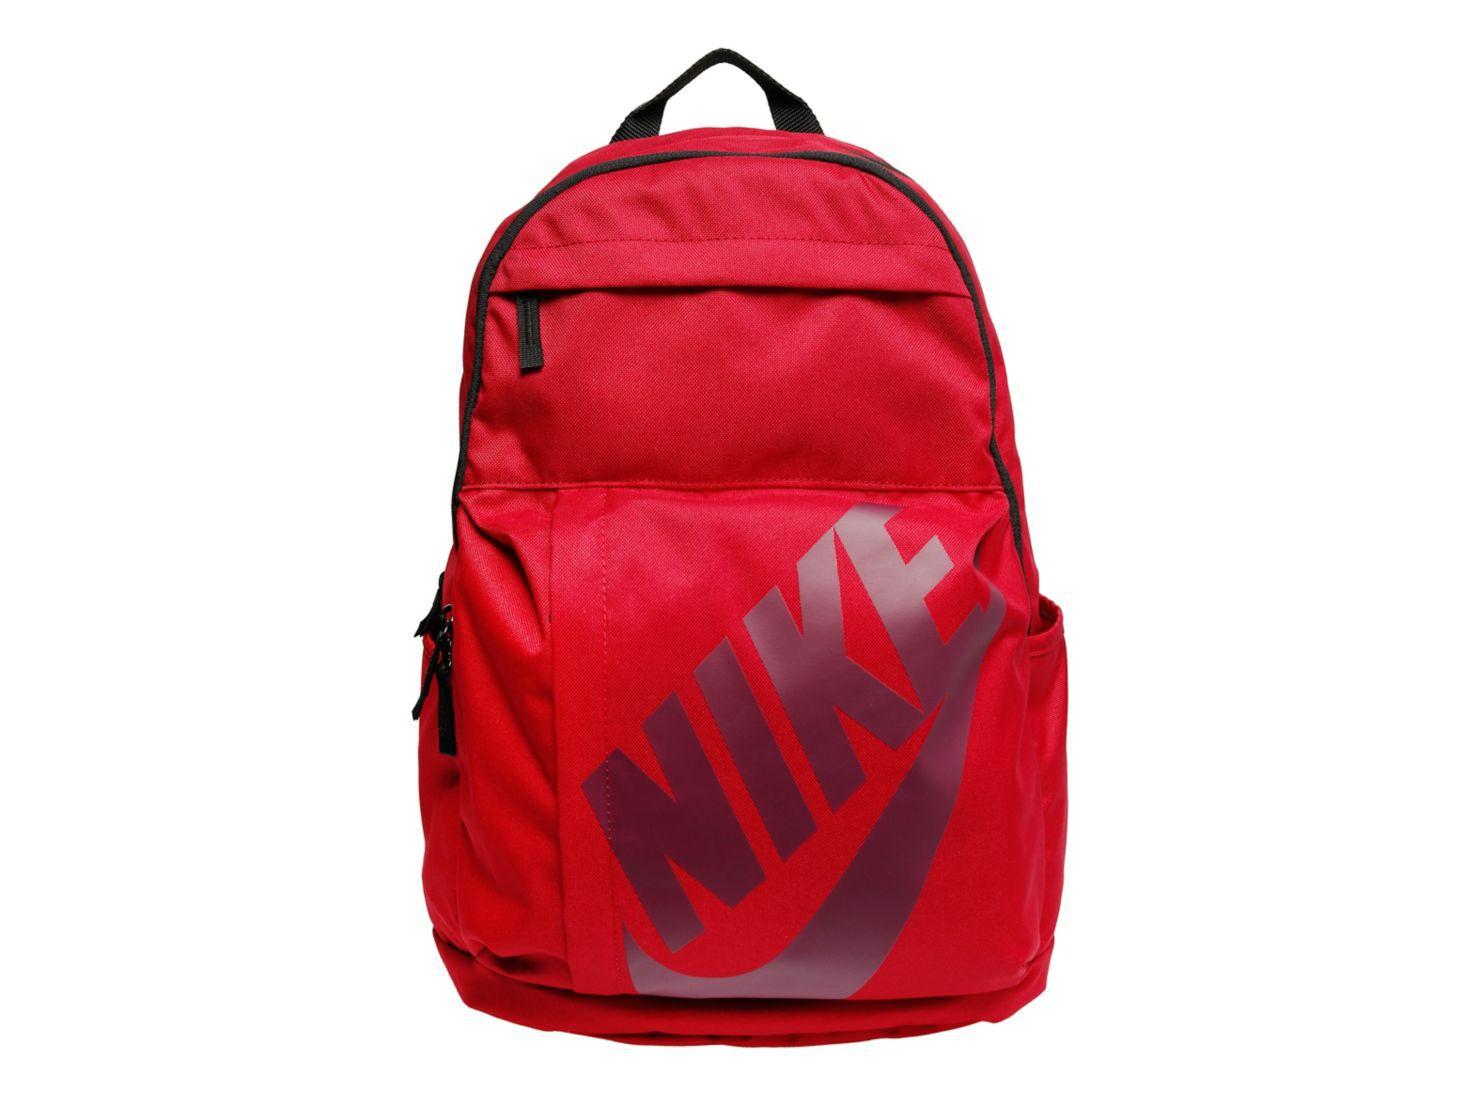 f718836bf Mochila Nike Elemental Hombre Roja en Mochilas Escolares | Paris